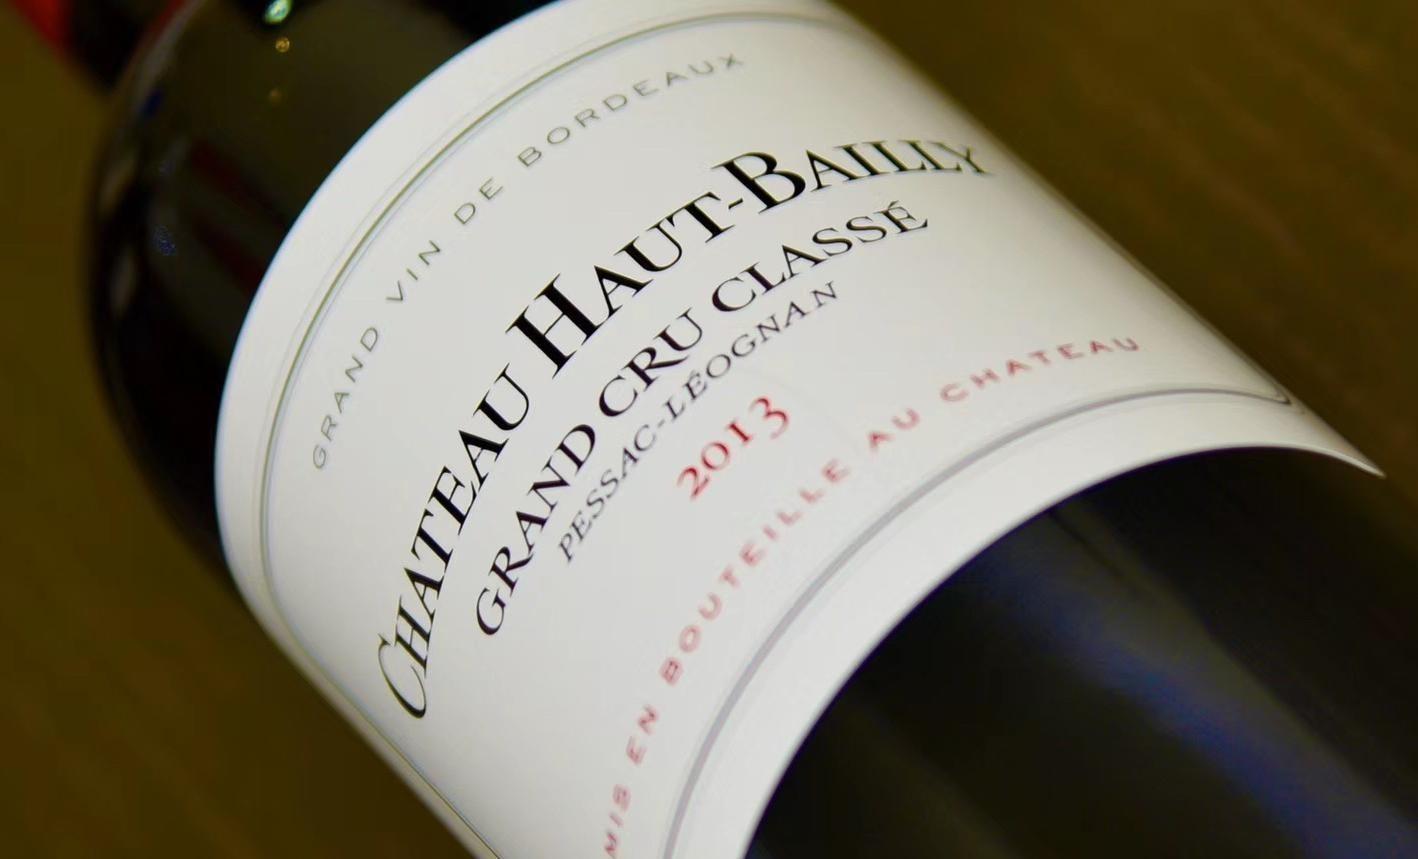 高柏丽酒庄干红葡萄酒 (Chateau Haut Bailly)